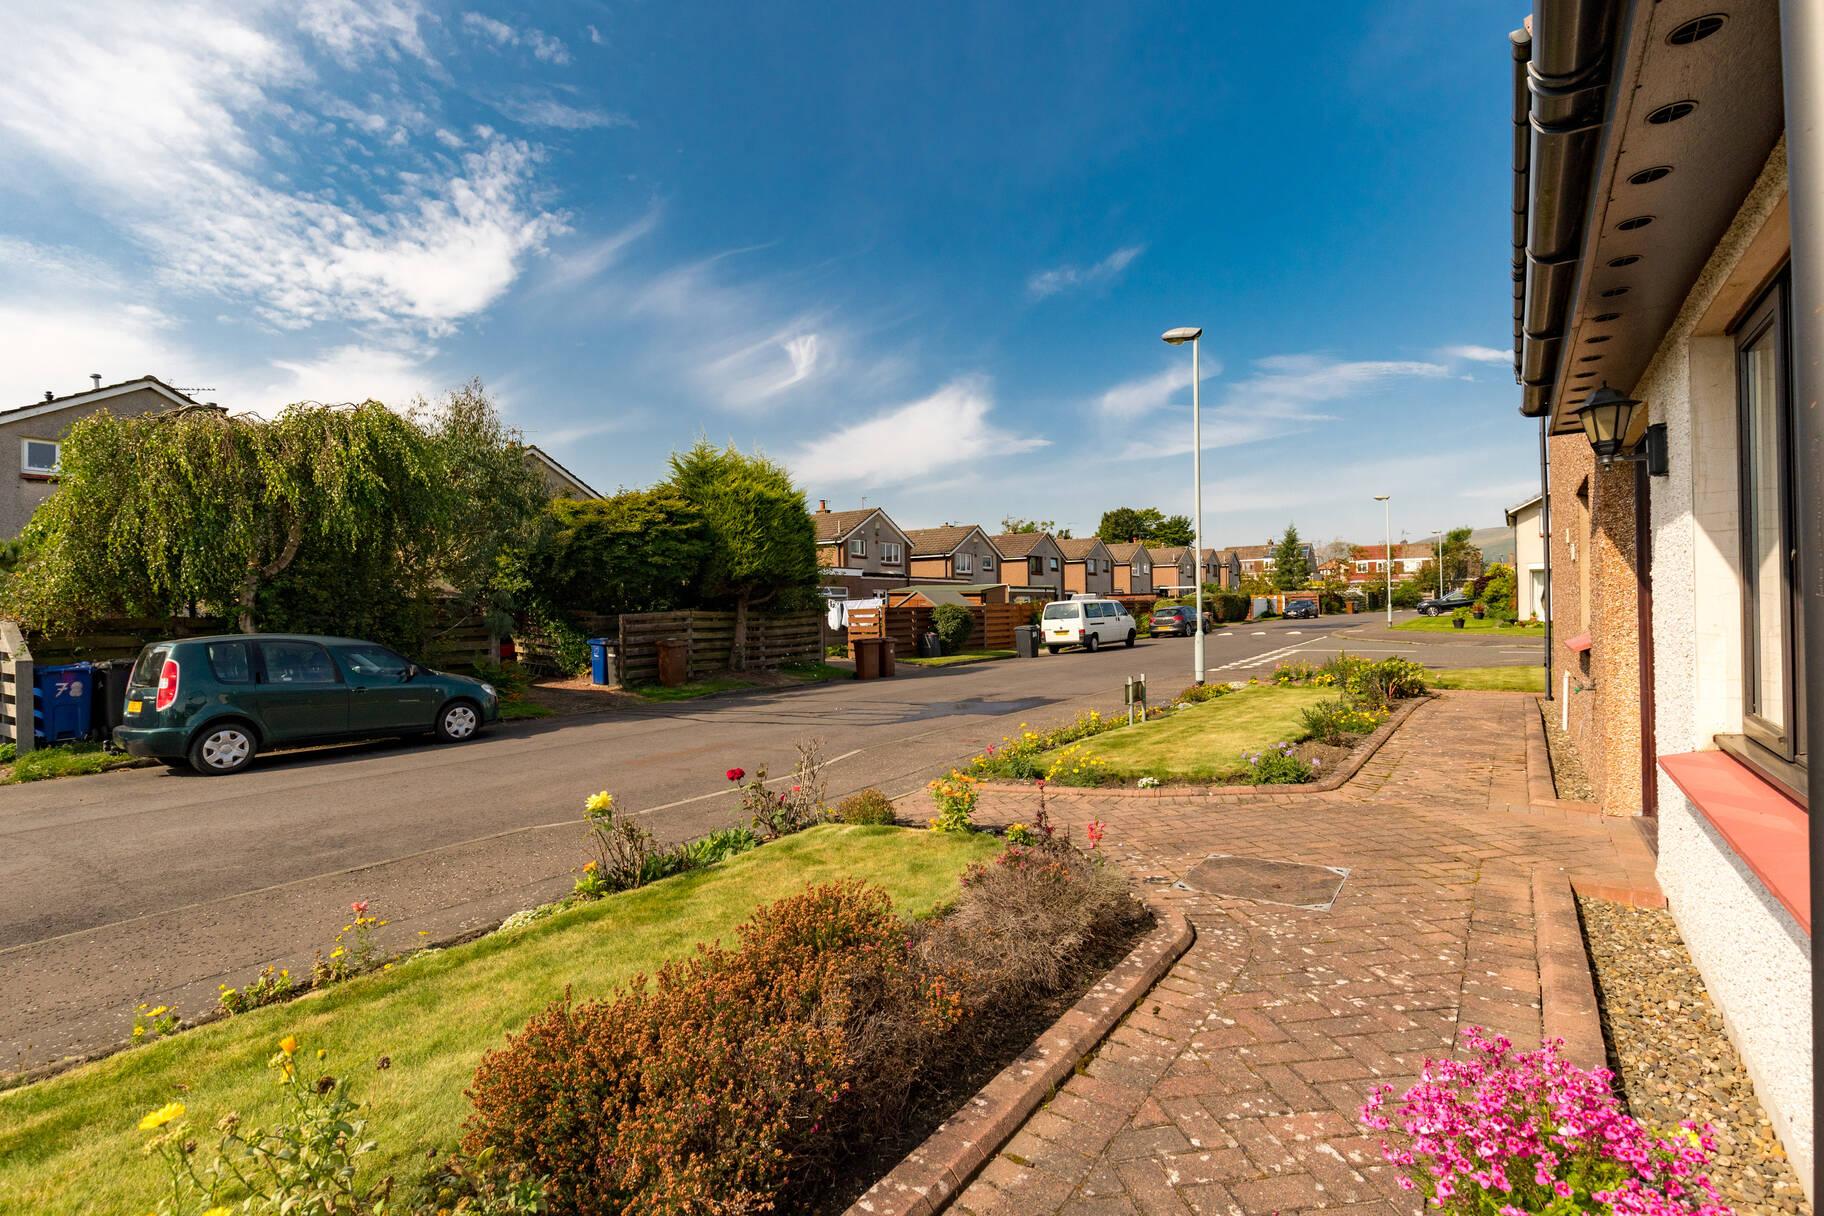 39 Crusader Drive, Roslin, Midlothian, EH25 9NL